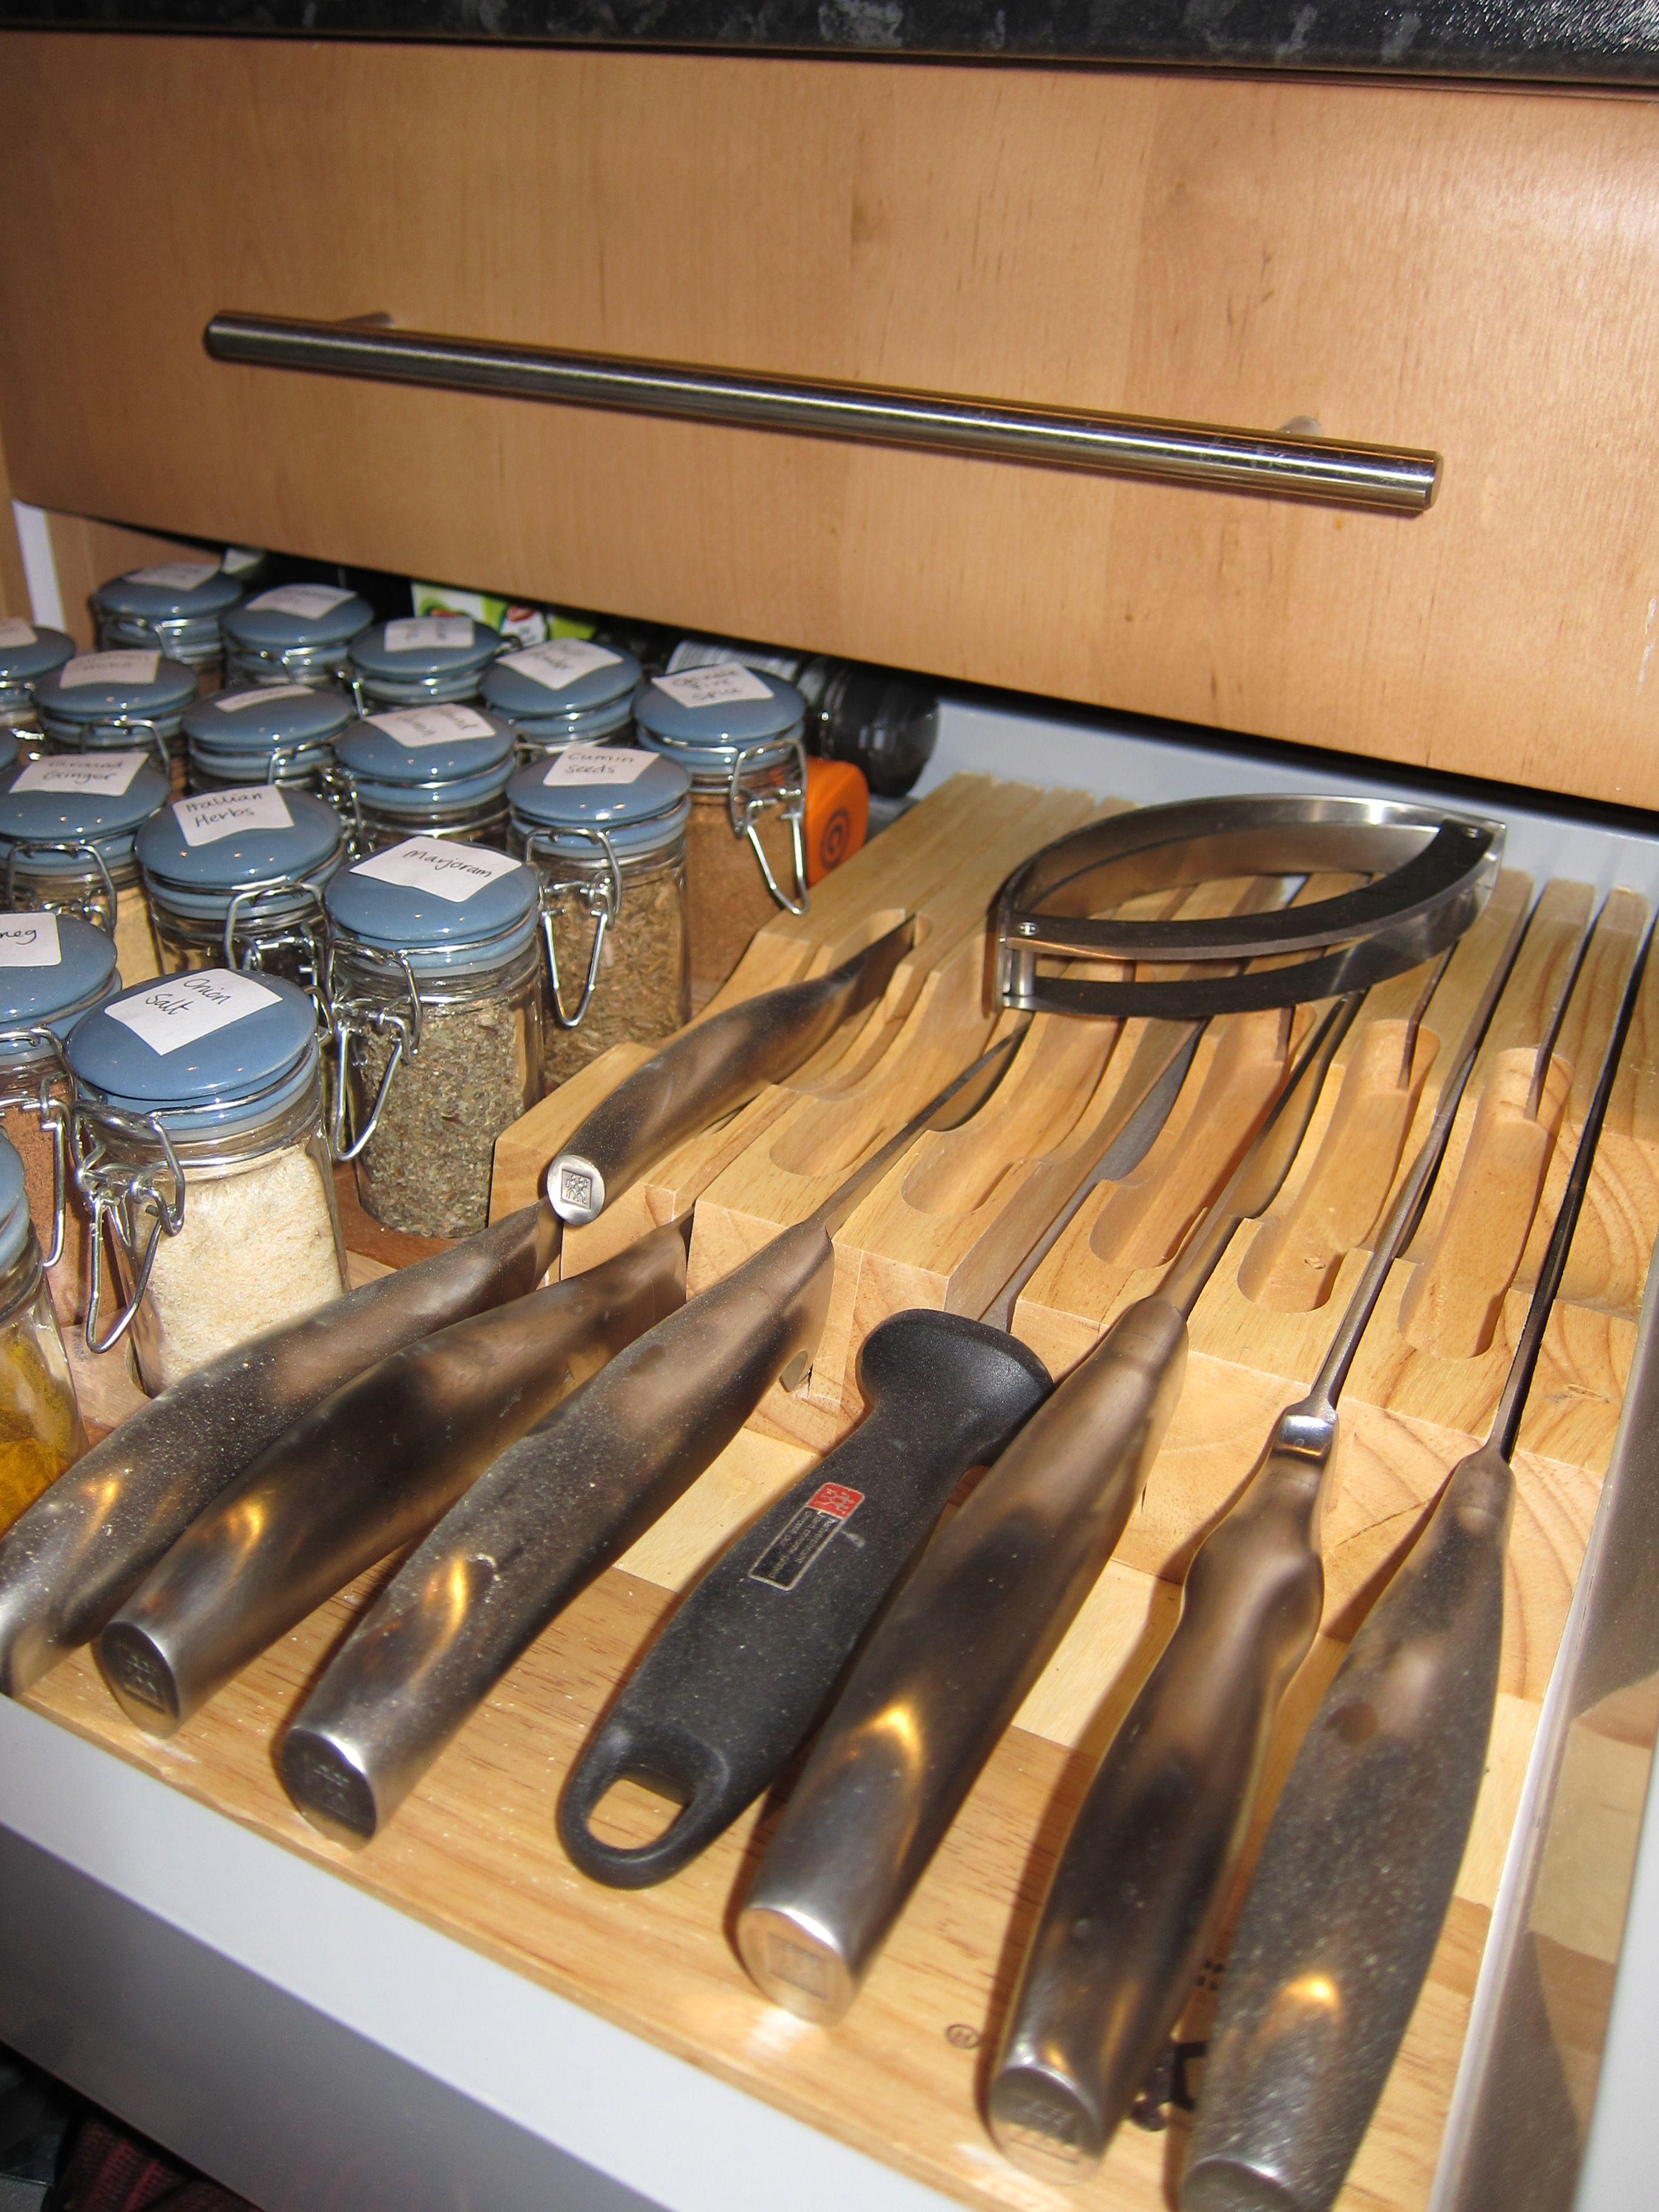 jamie oliver spice jars and henckels knife block in internal